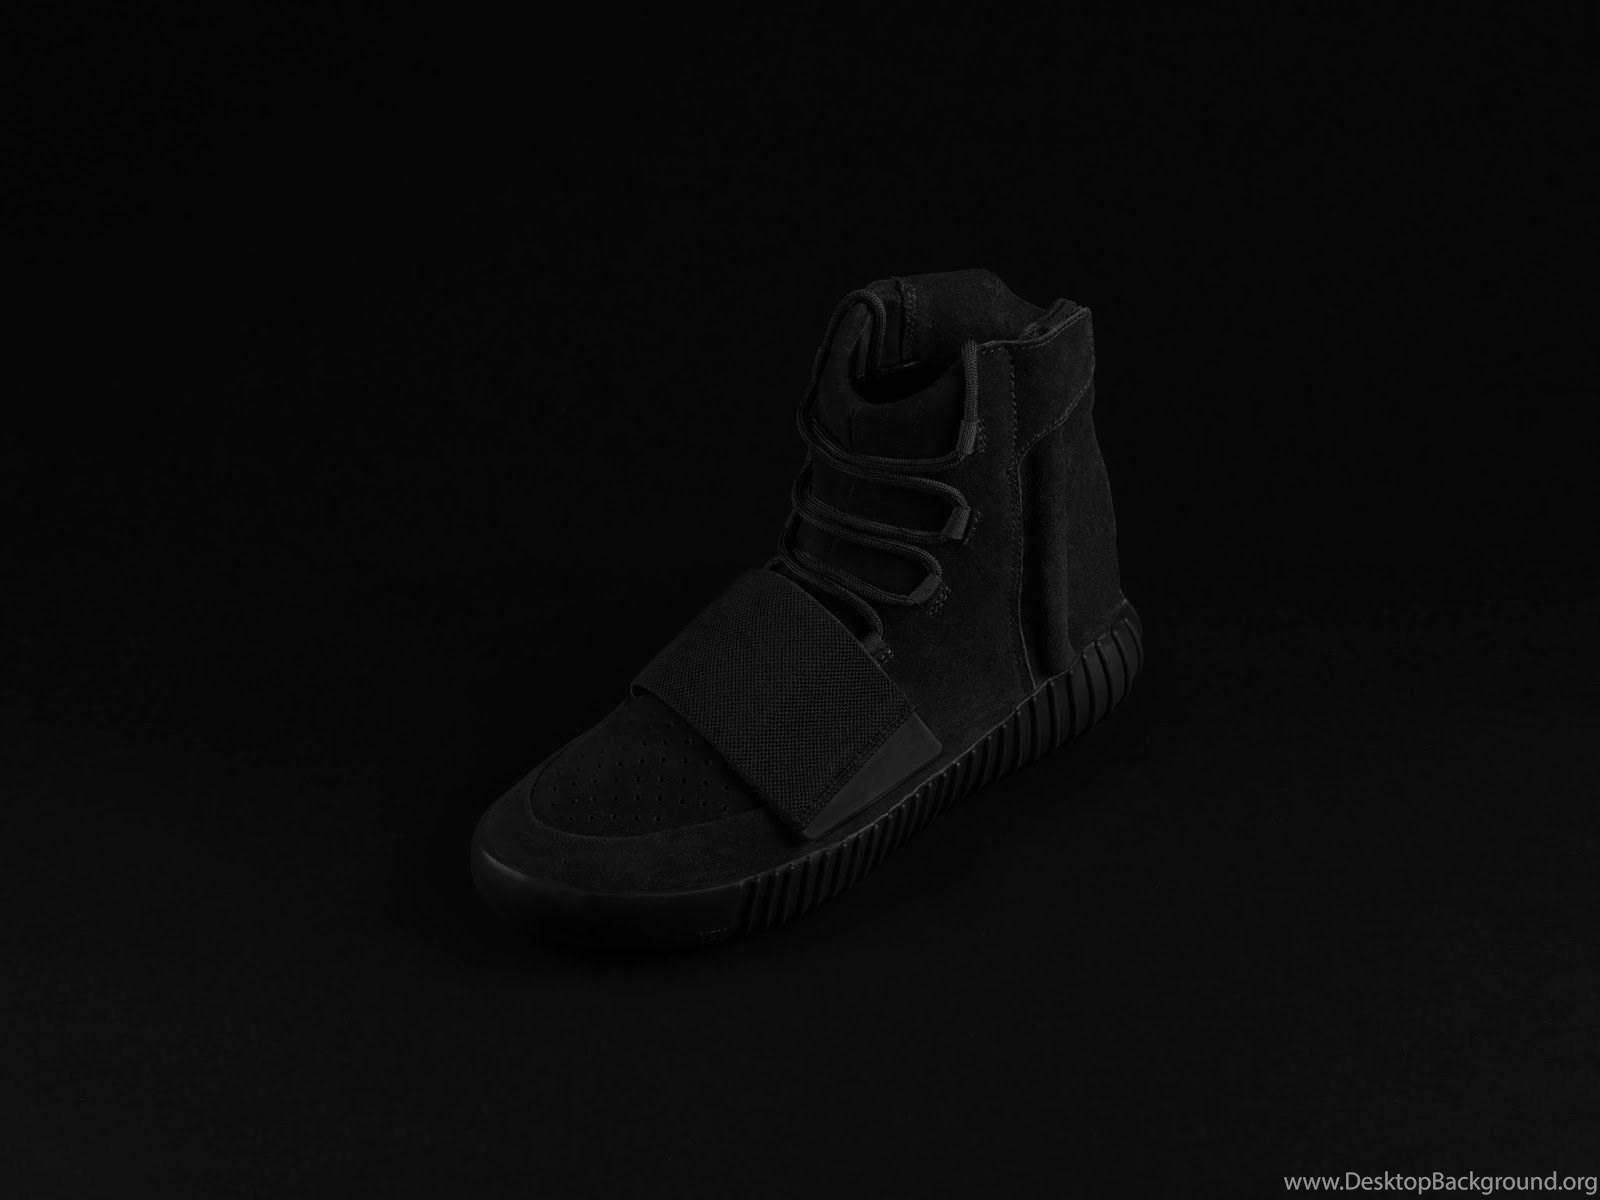 Swag Craze Adidas Originals By Kanye West Yeezy Boost 750 Release